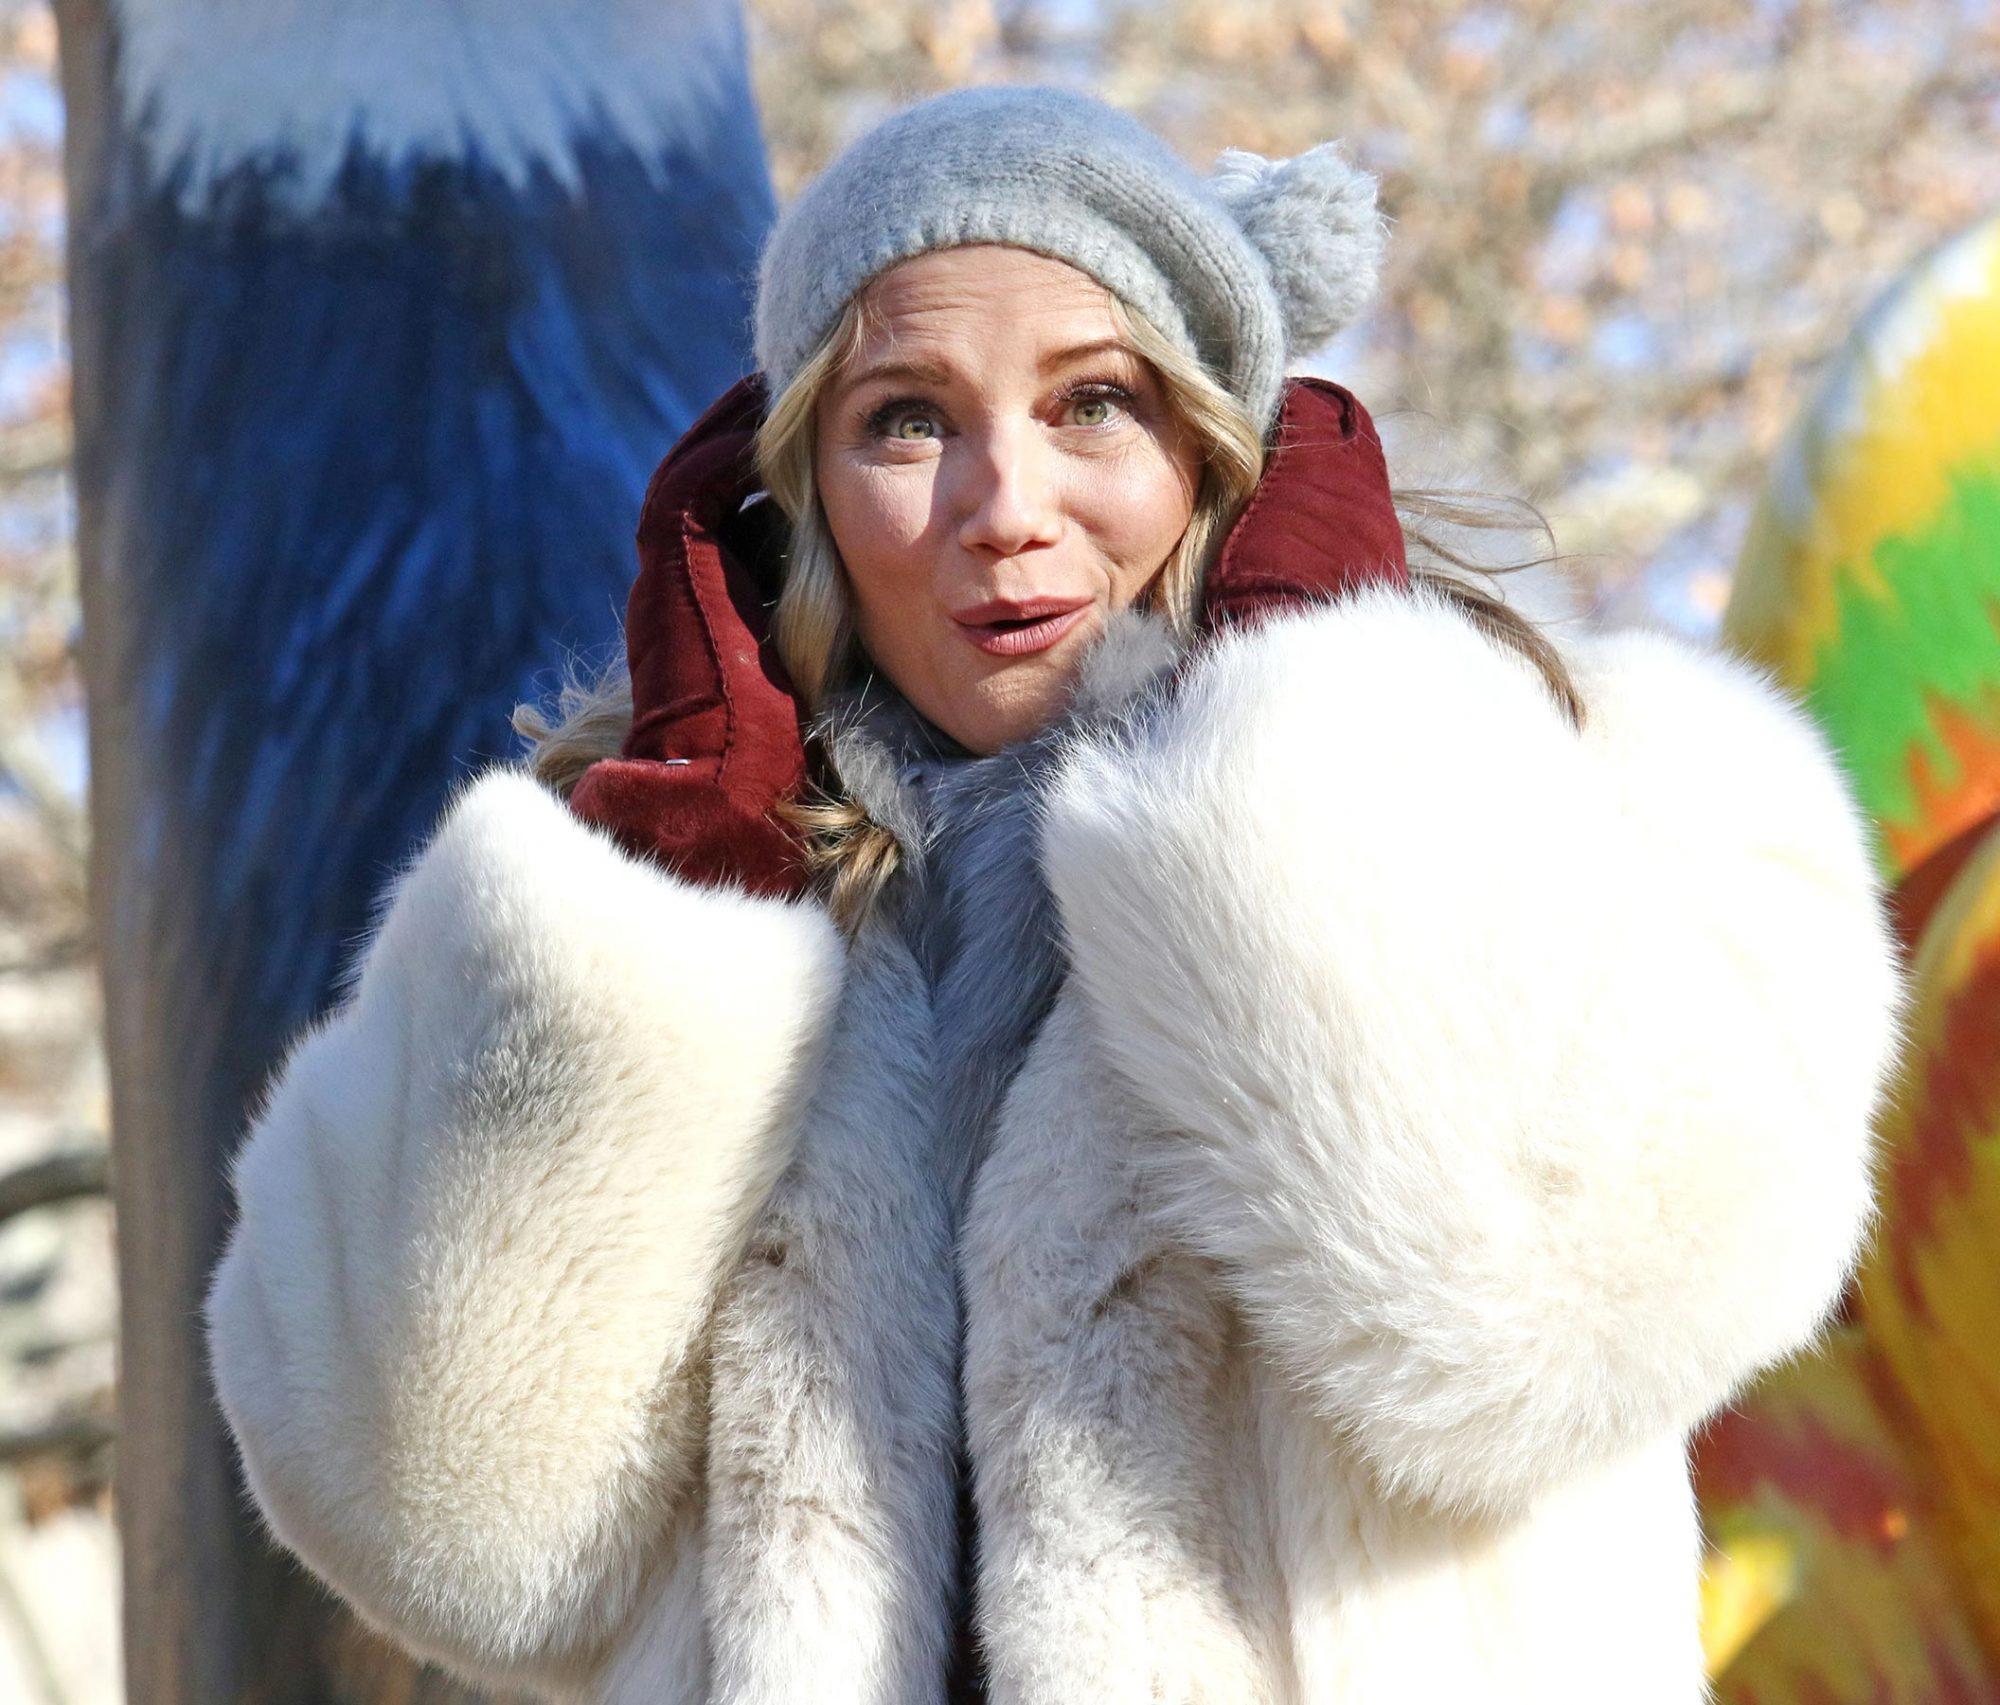 Celebrity Sightings in New York City - November 22, 2018